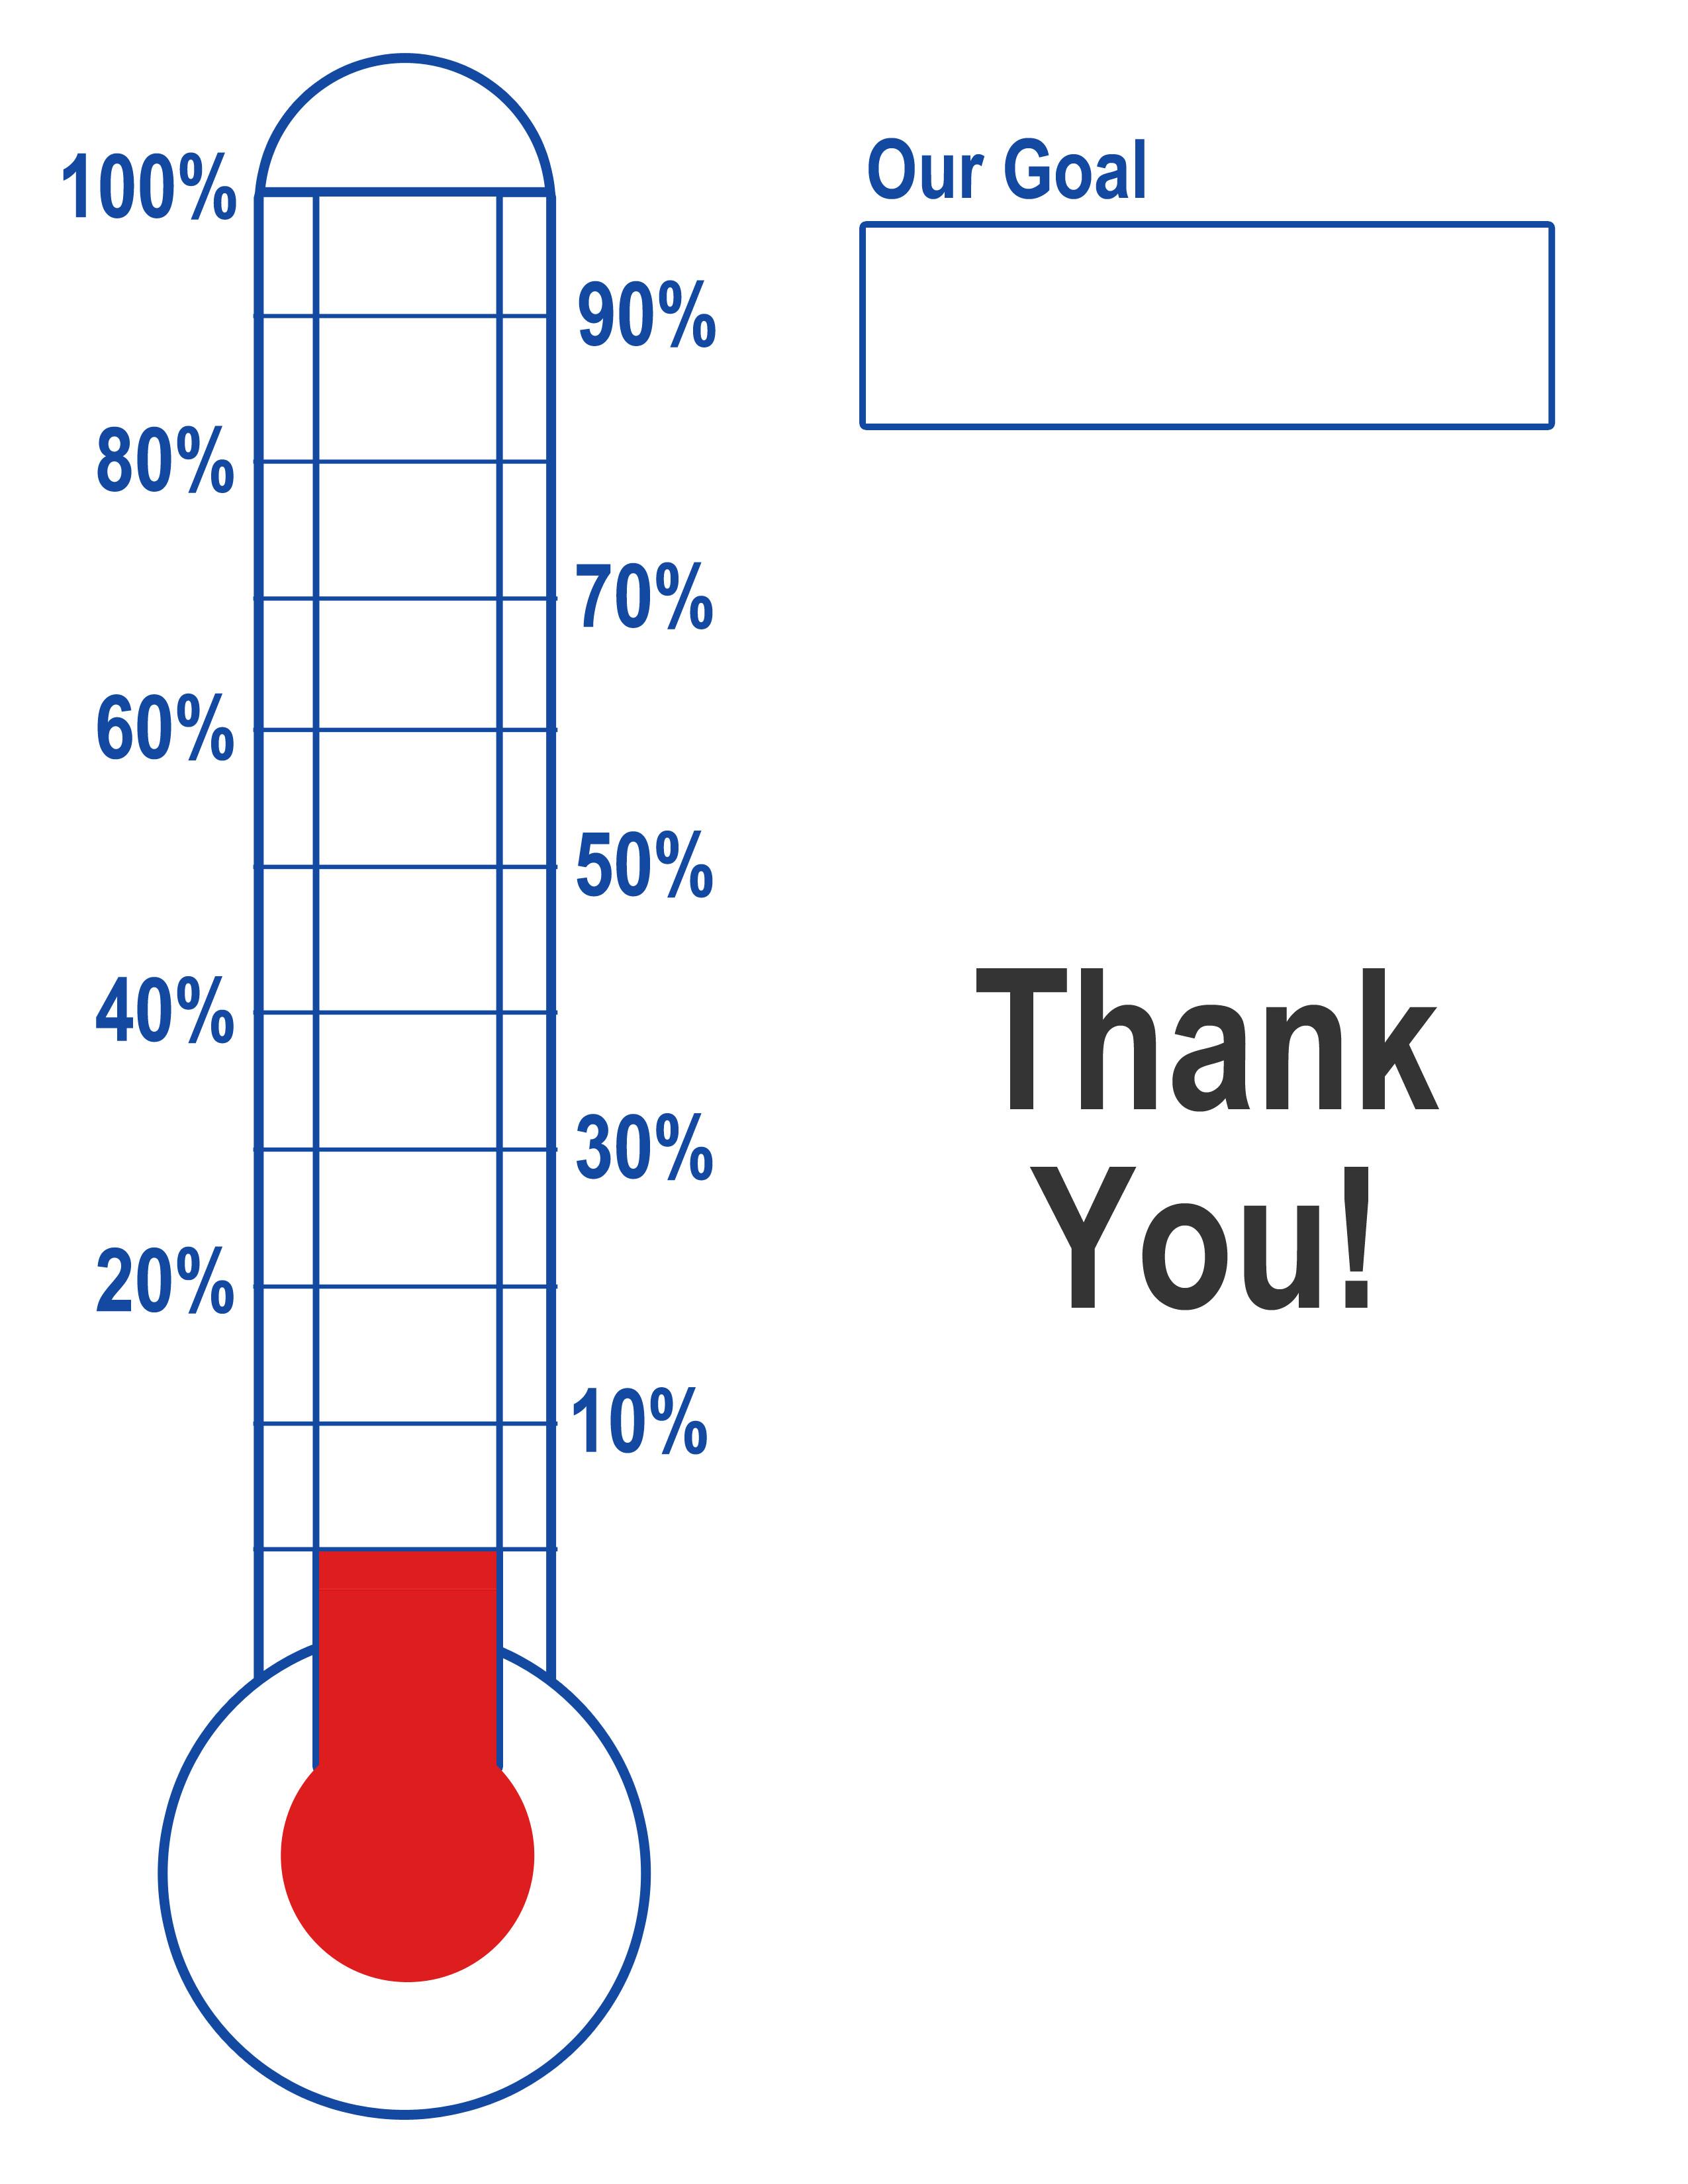 printable fundraising goal chart cwnbjj4pr7tryqe24tqq kxeomlqaqtebhgmt1jldys